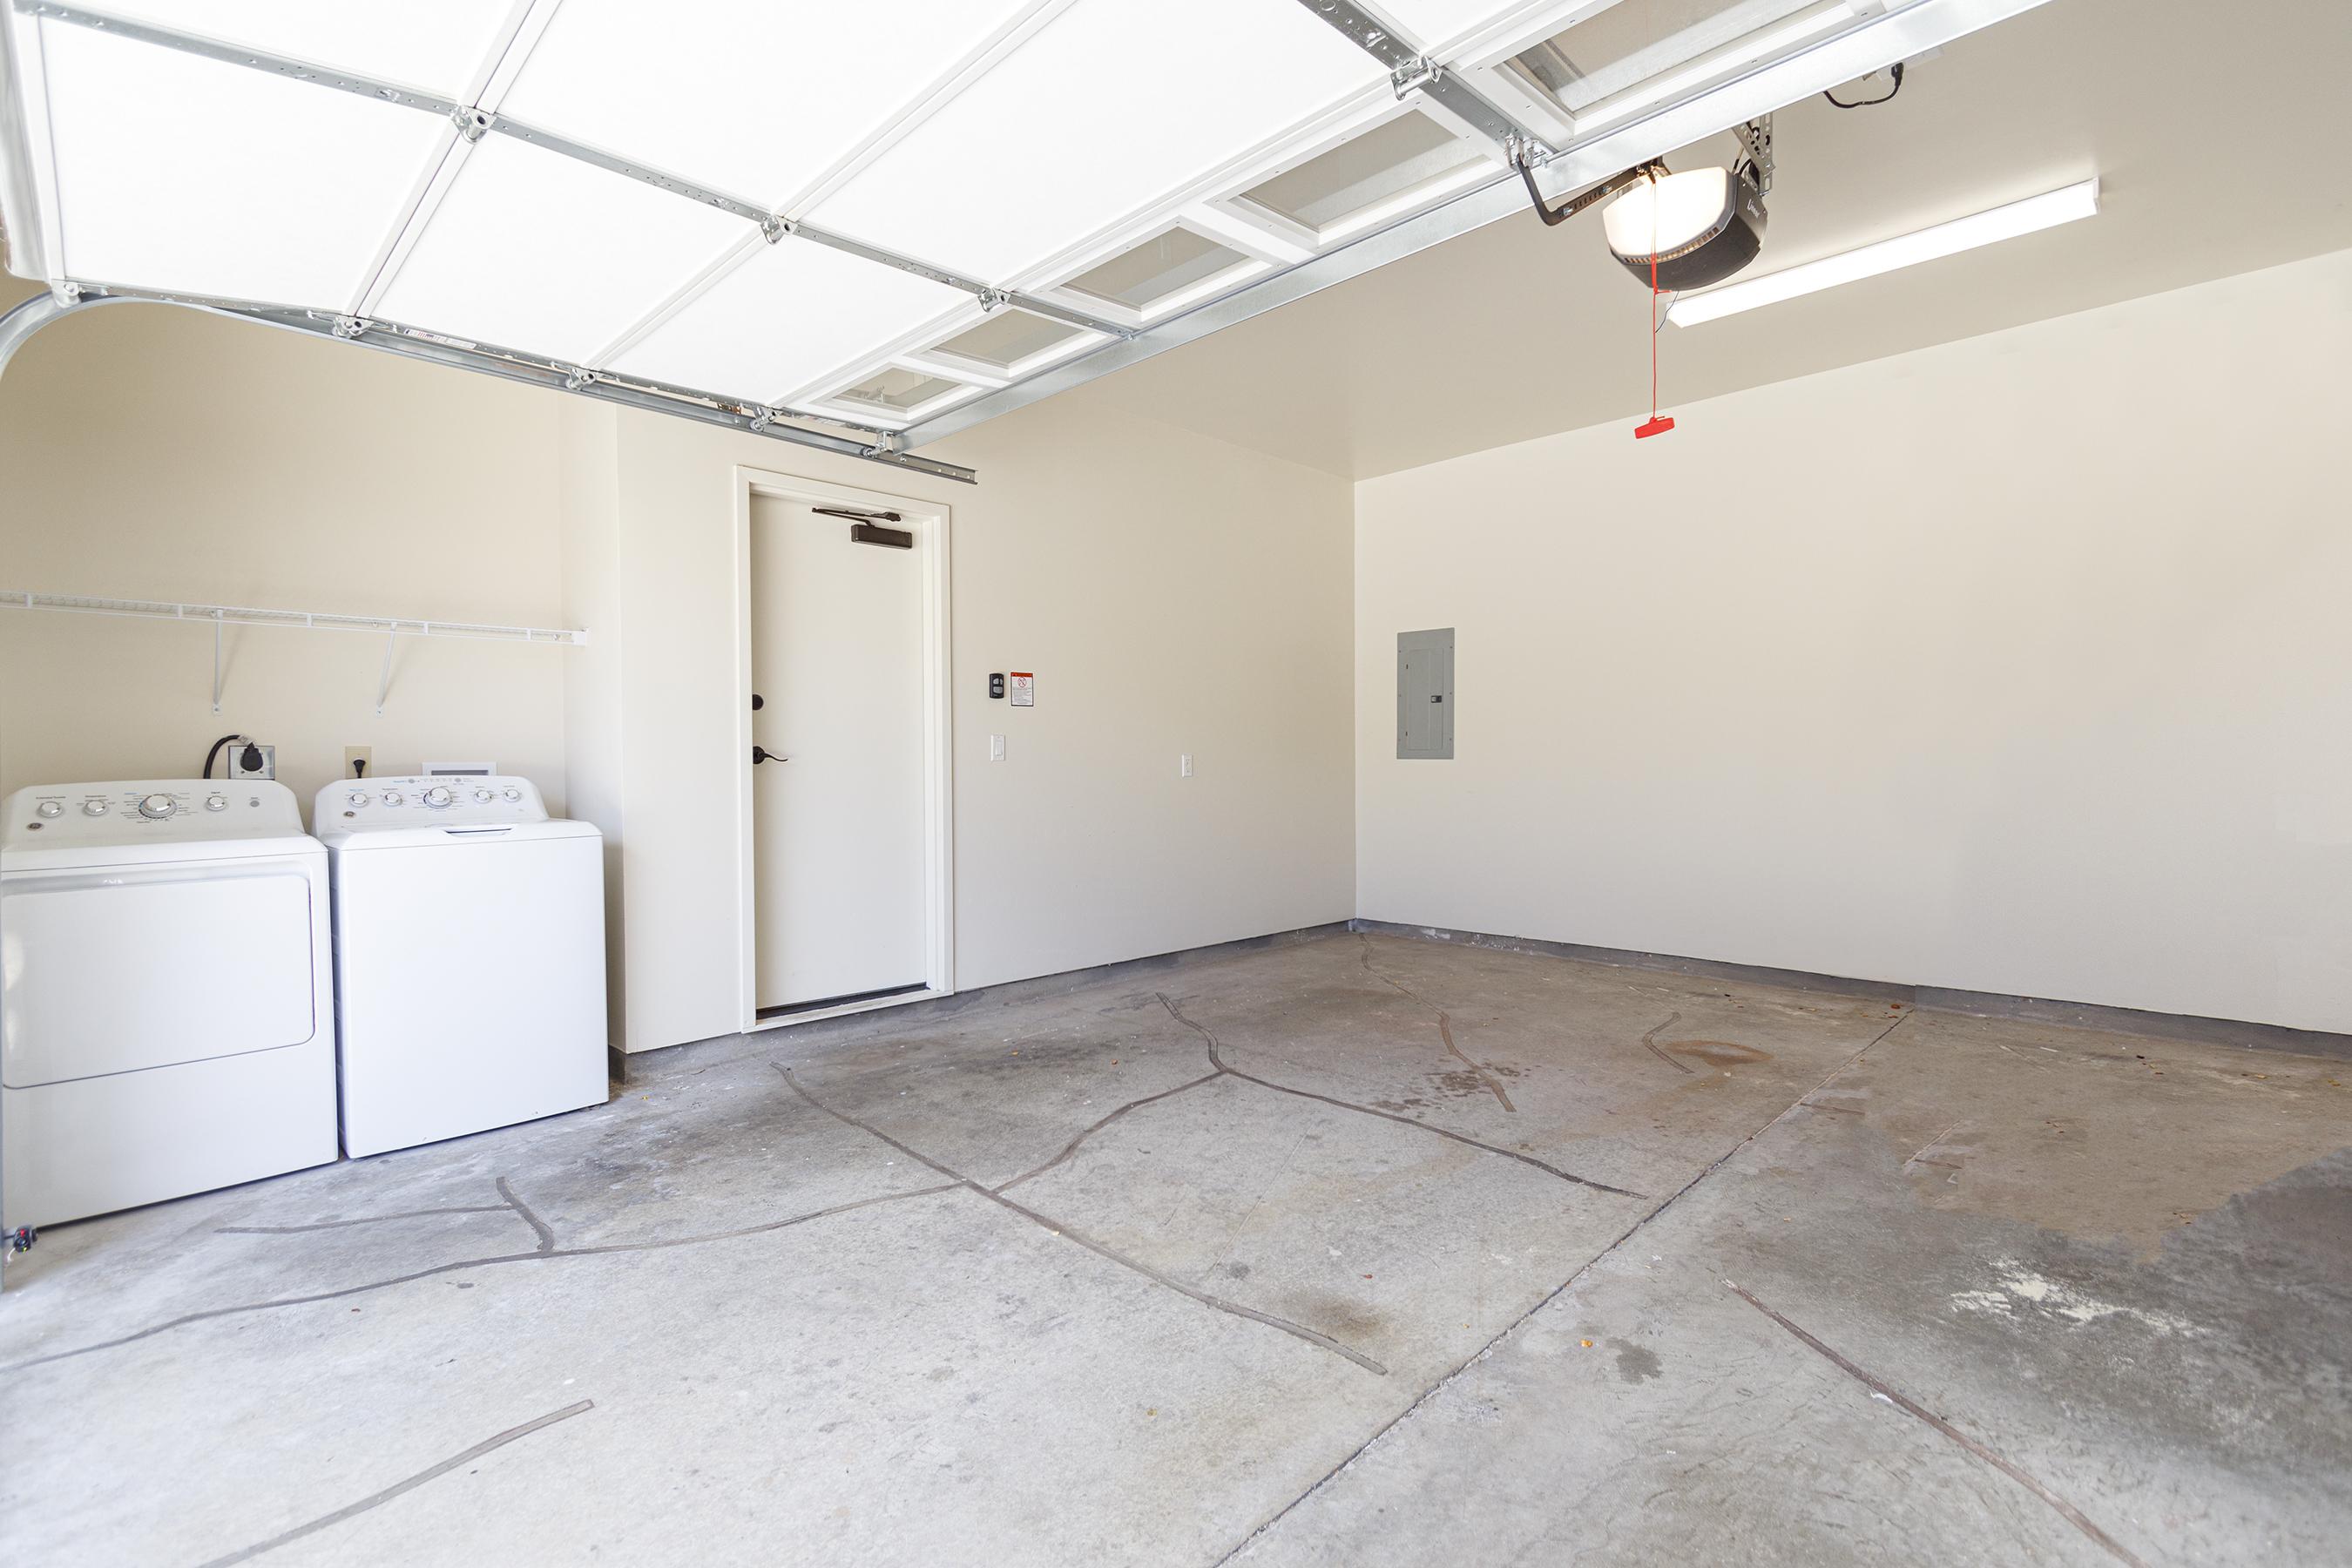 Laundry and garage at 580 Lunalilo Home Road VB2409